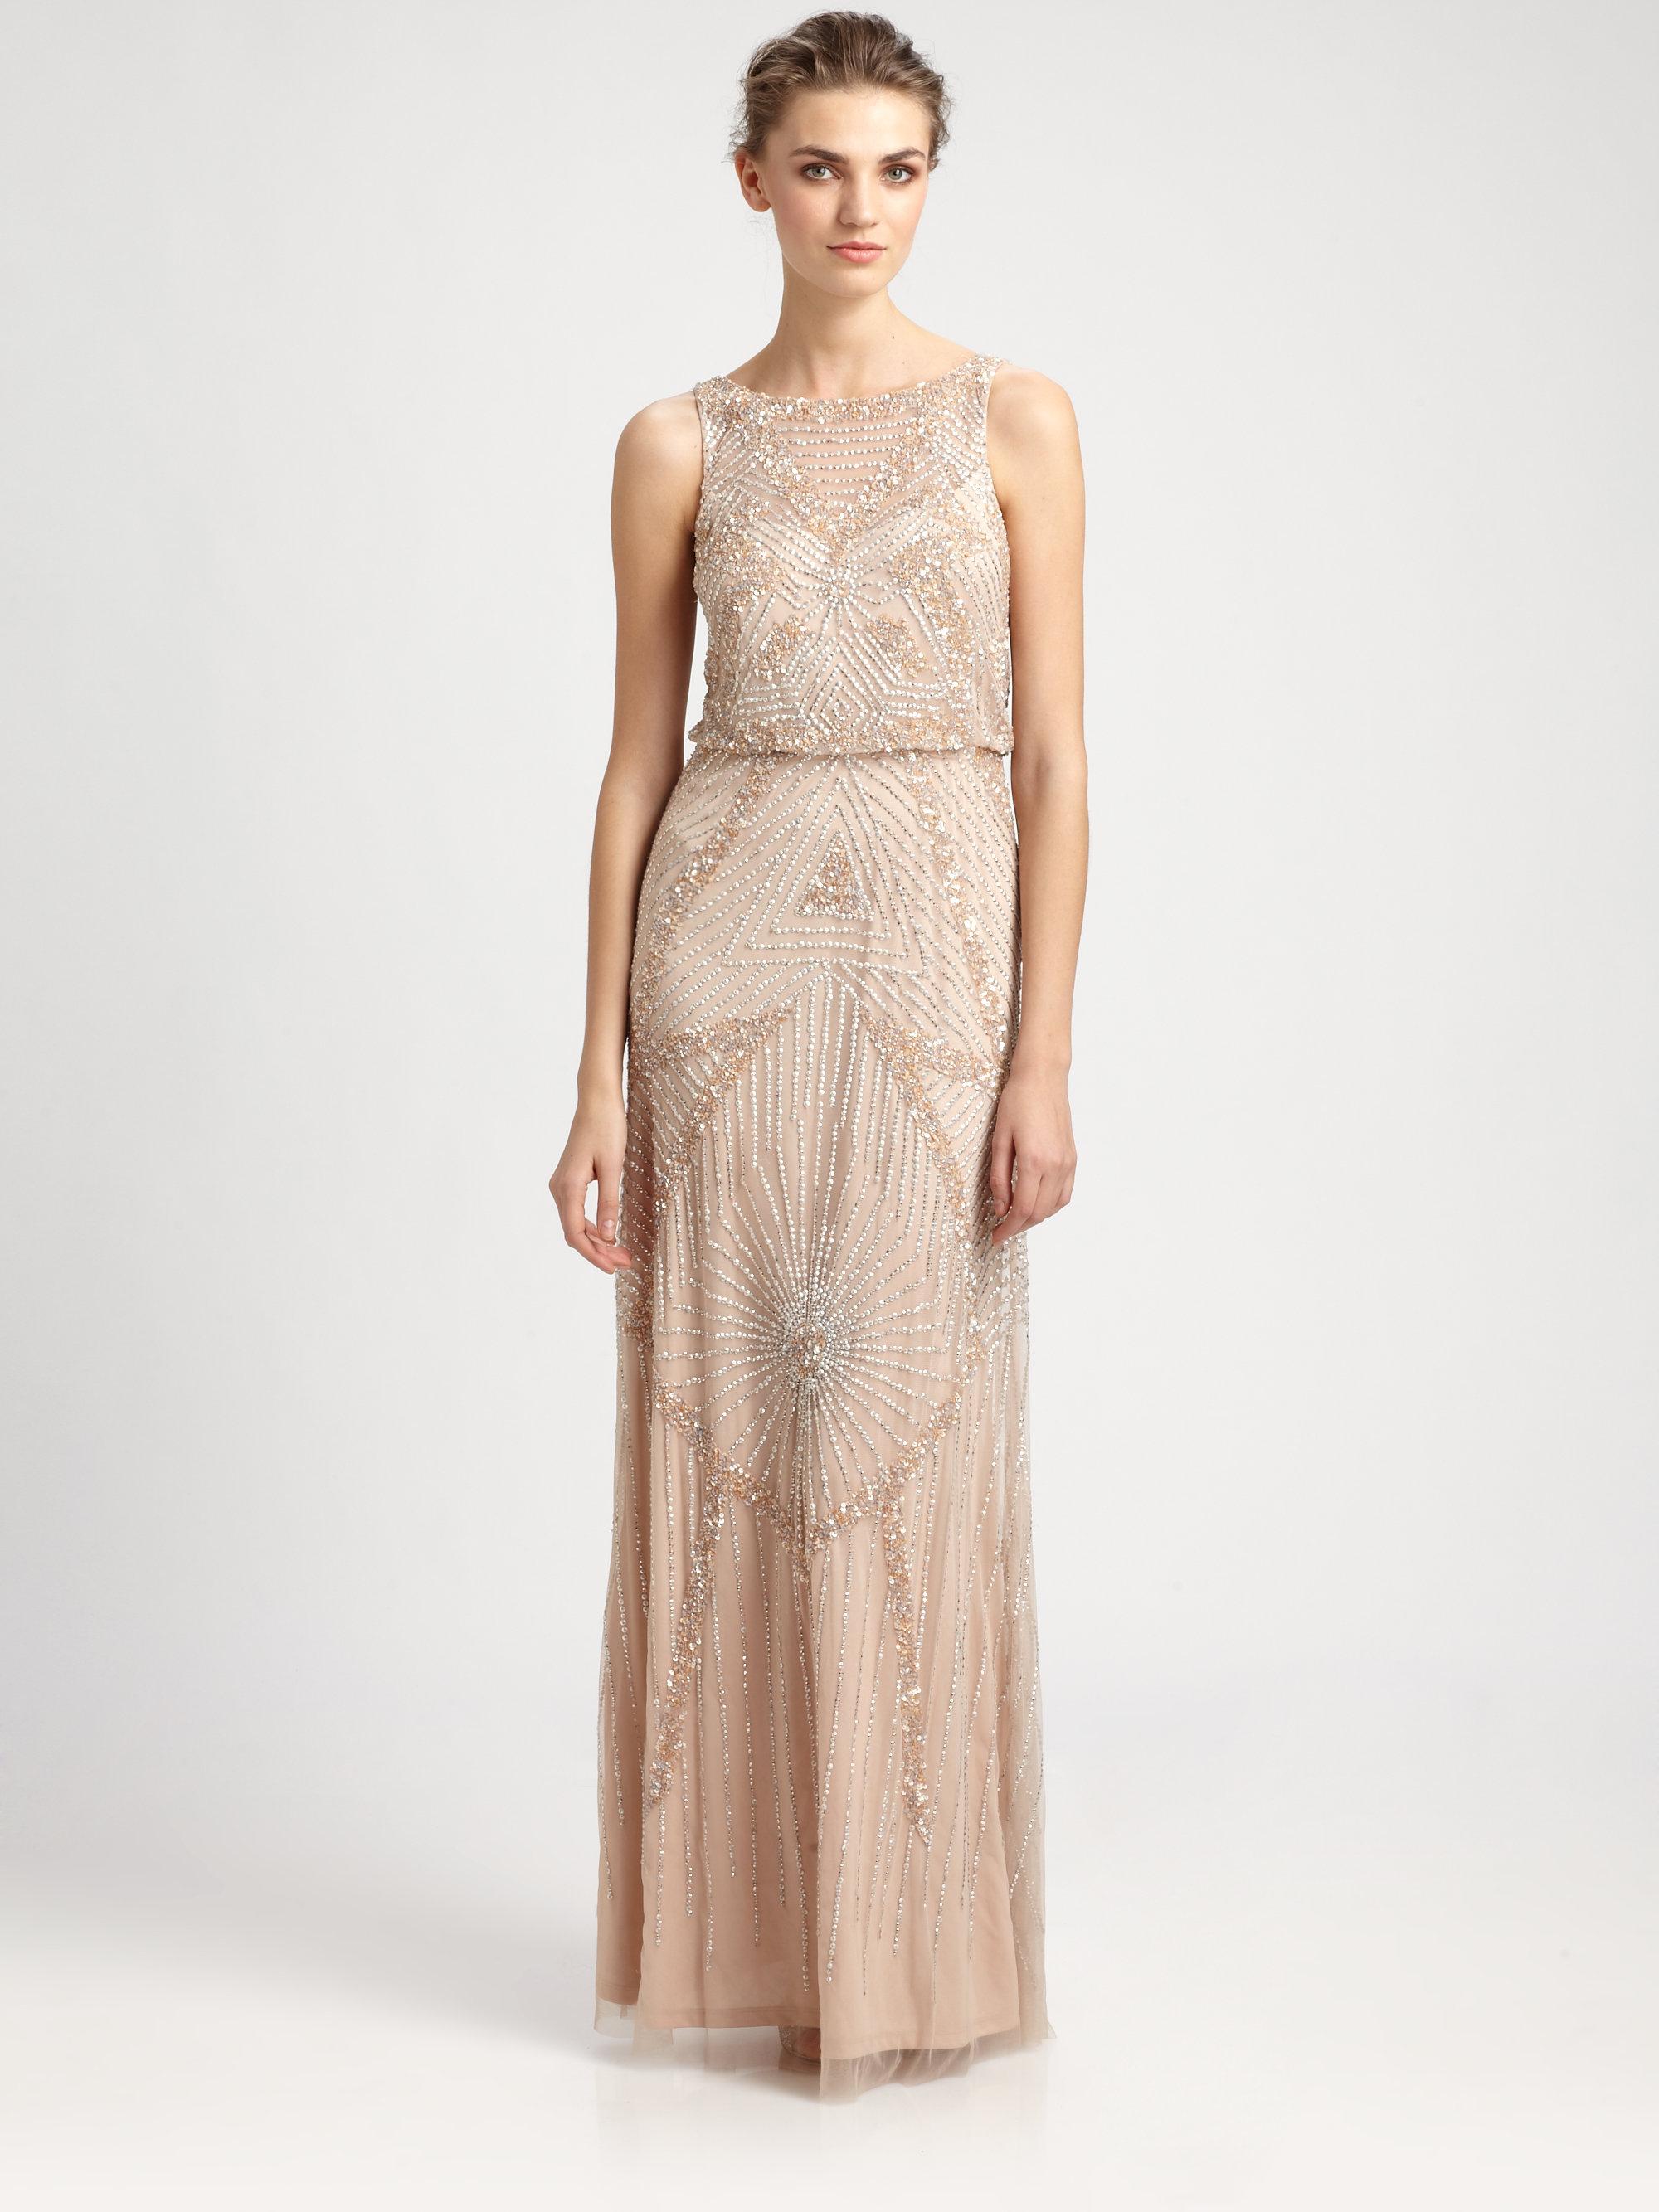 Sleeveless Beaded Blouson Gown With Illusion Details | Lauren Goss